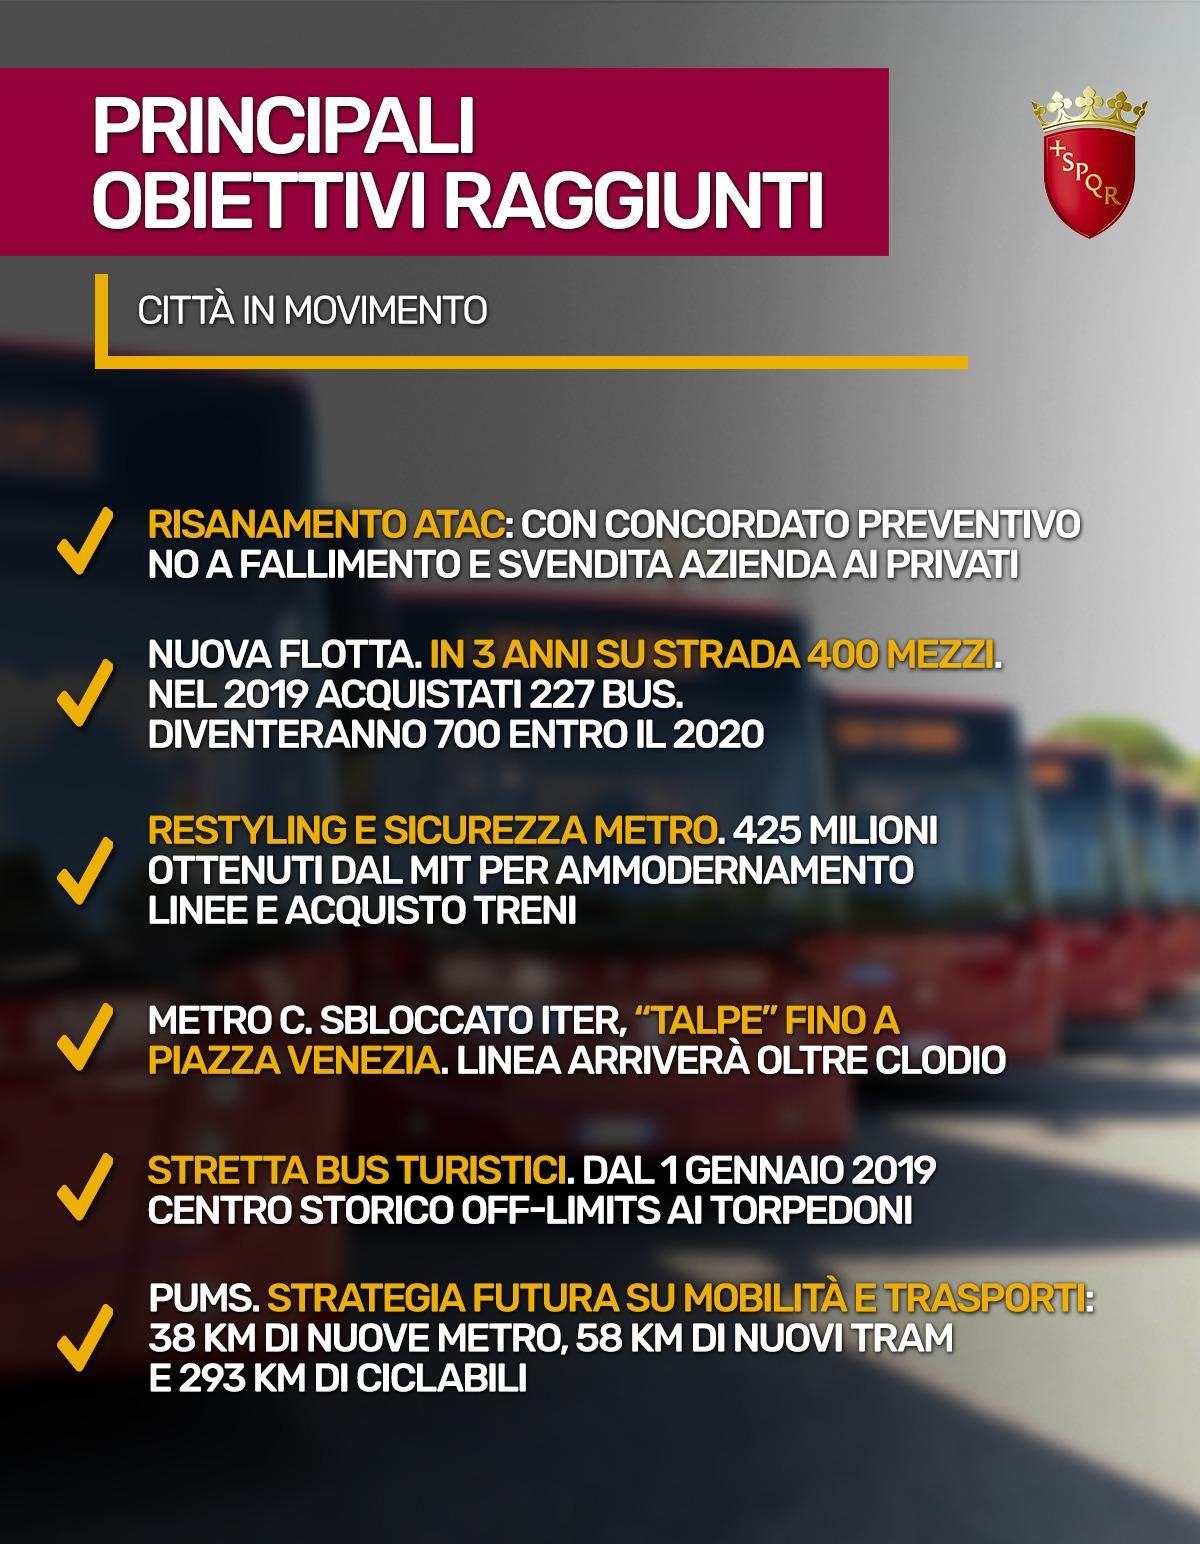 da Fb Pietro Calabrese bilancio febbraio 2020